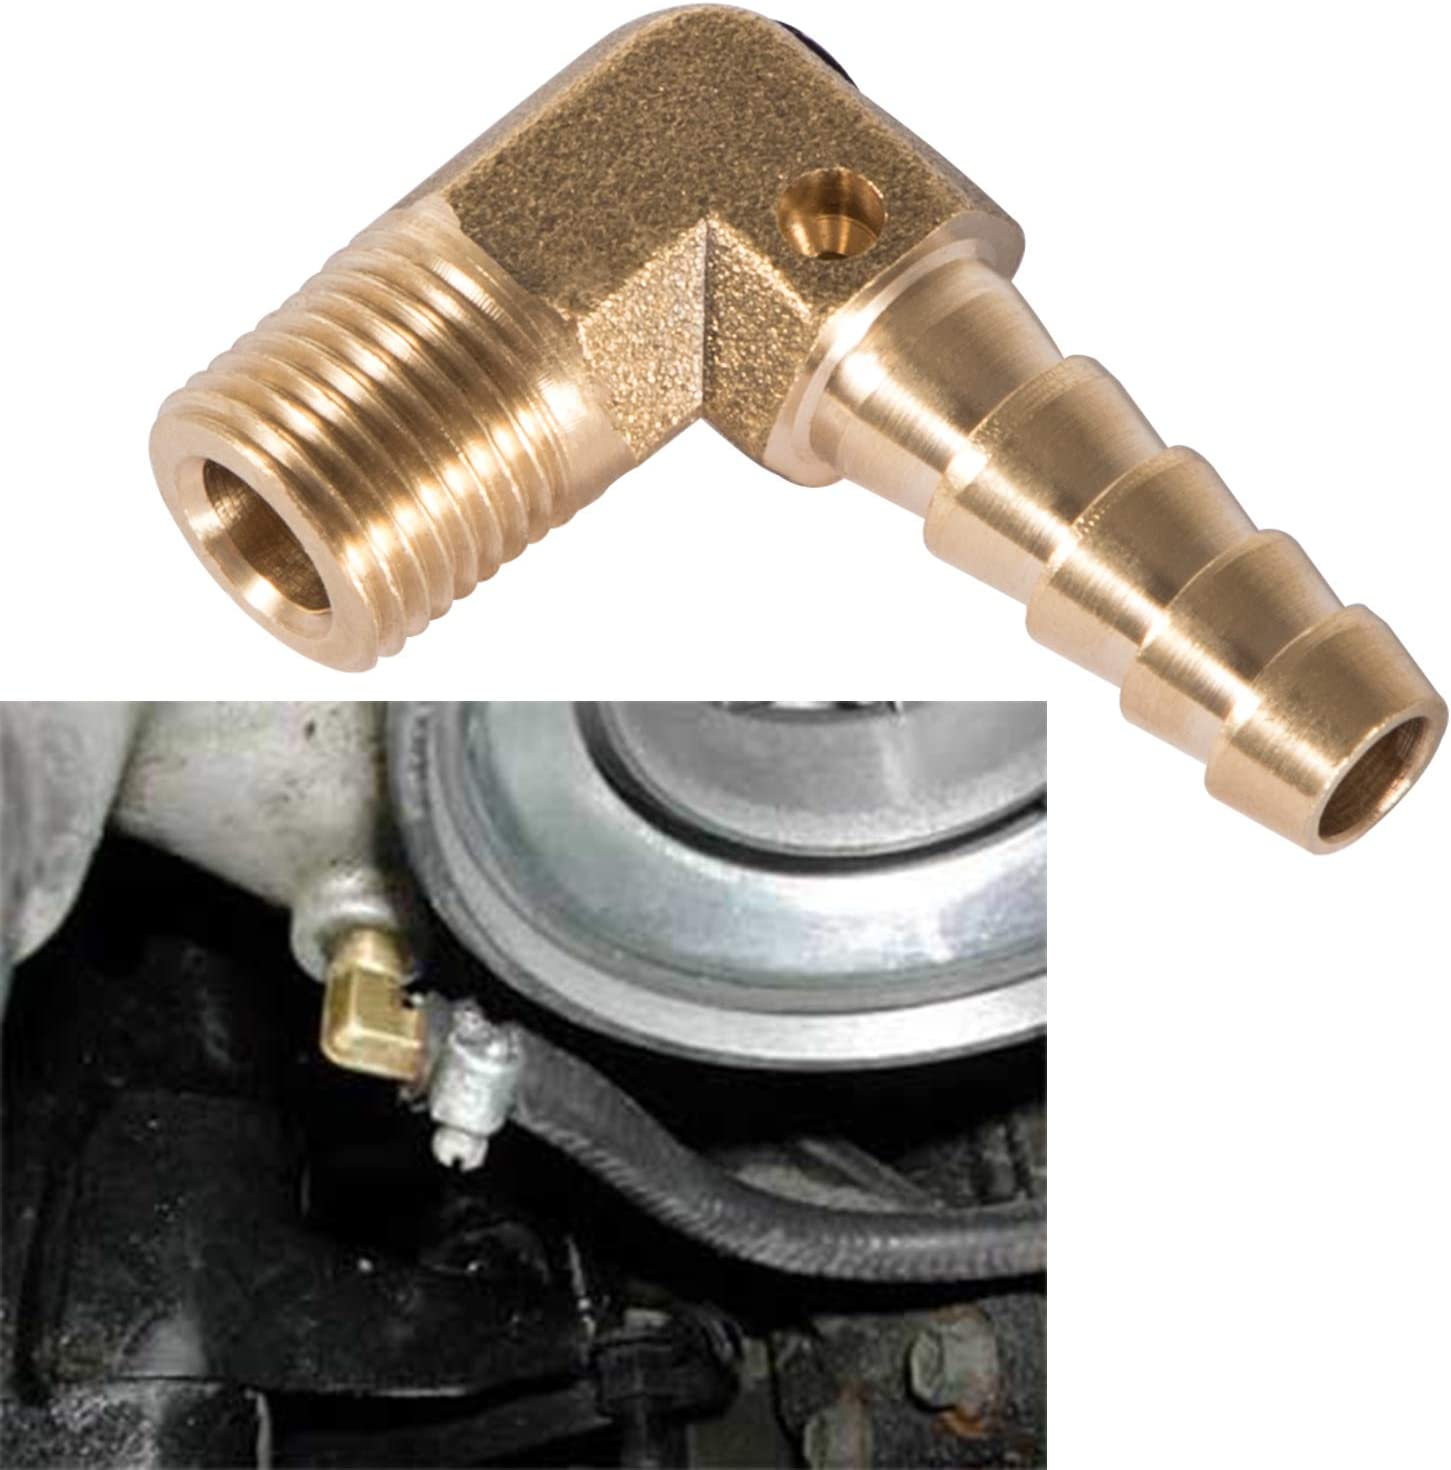 Adjustable Boost Elbow Controller Brass For Dodge Cummins 1994 ...